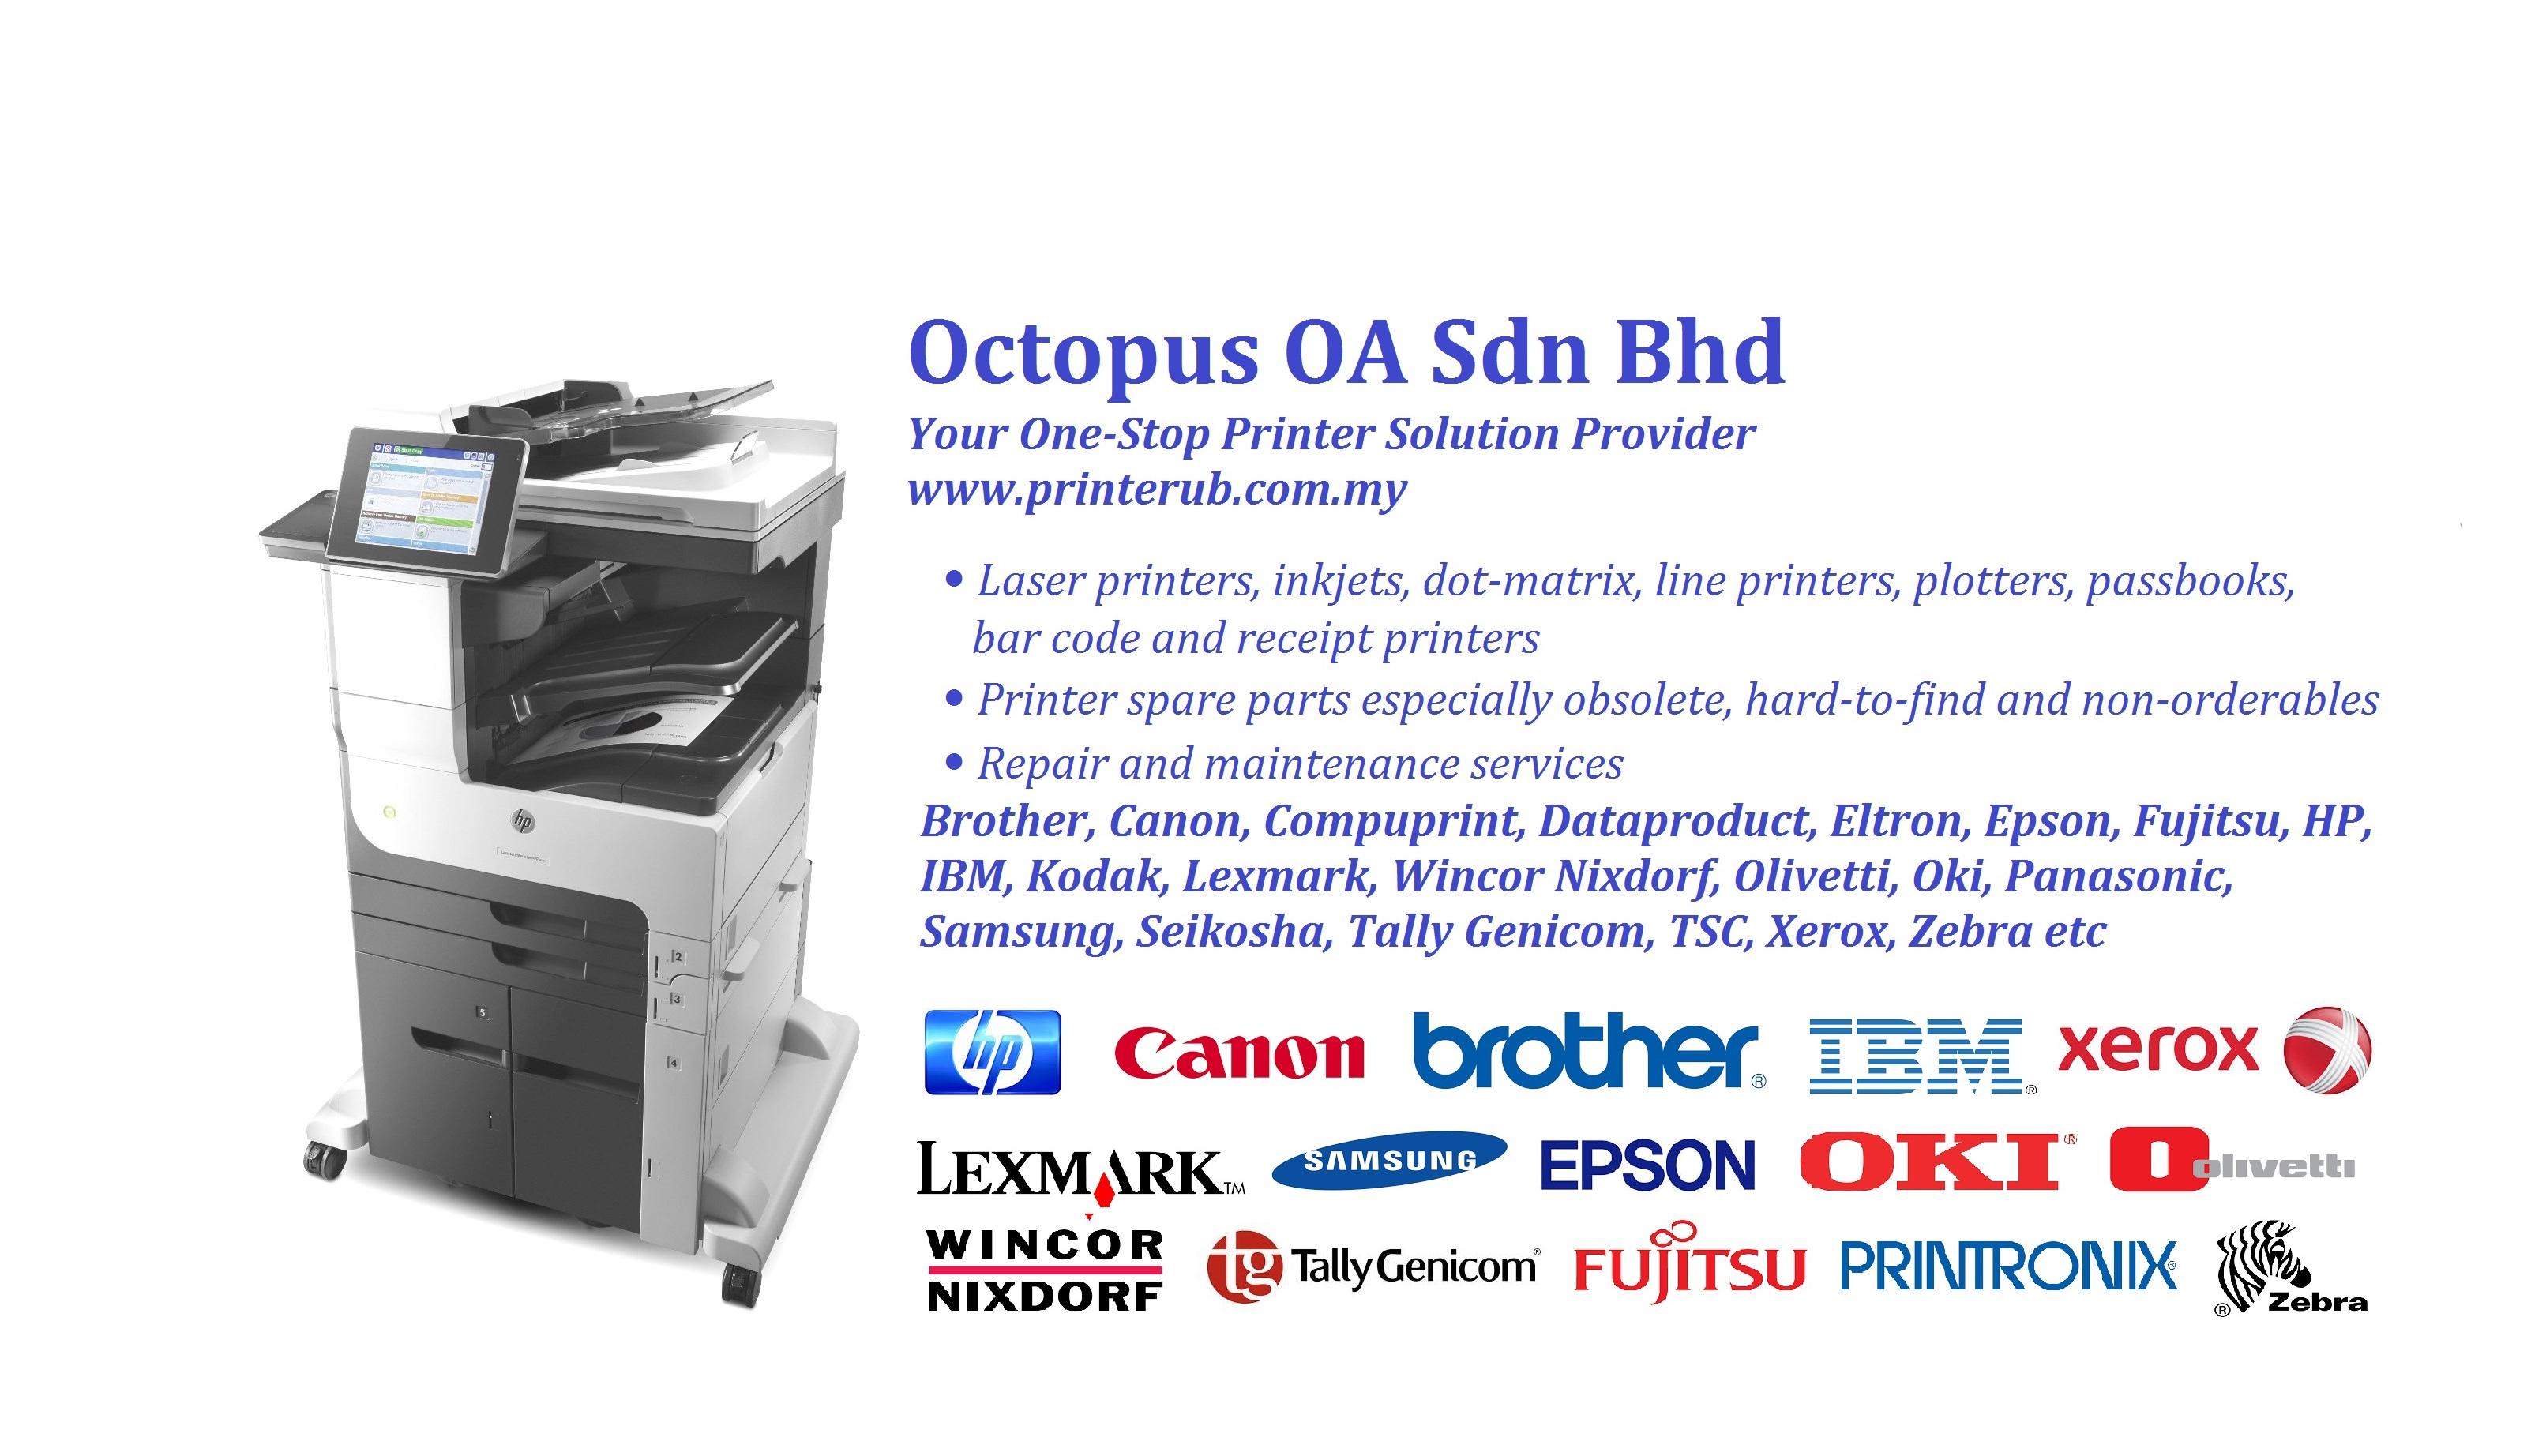 Octopus OA Sdn Bhd